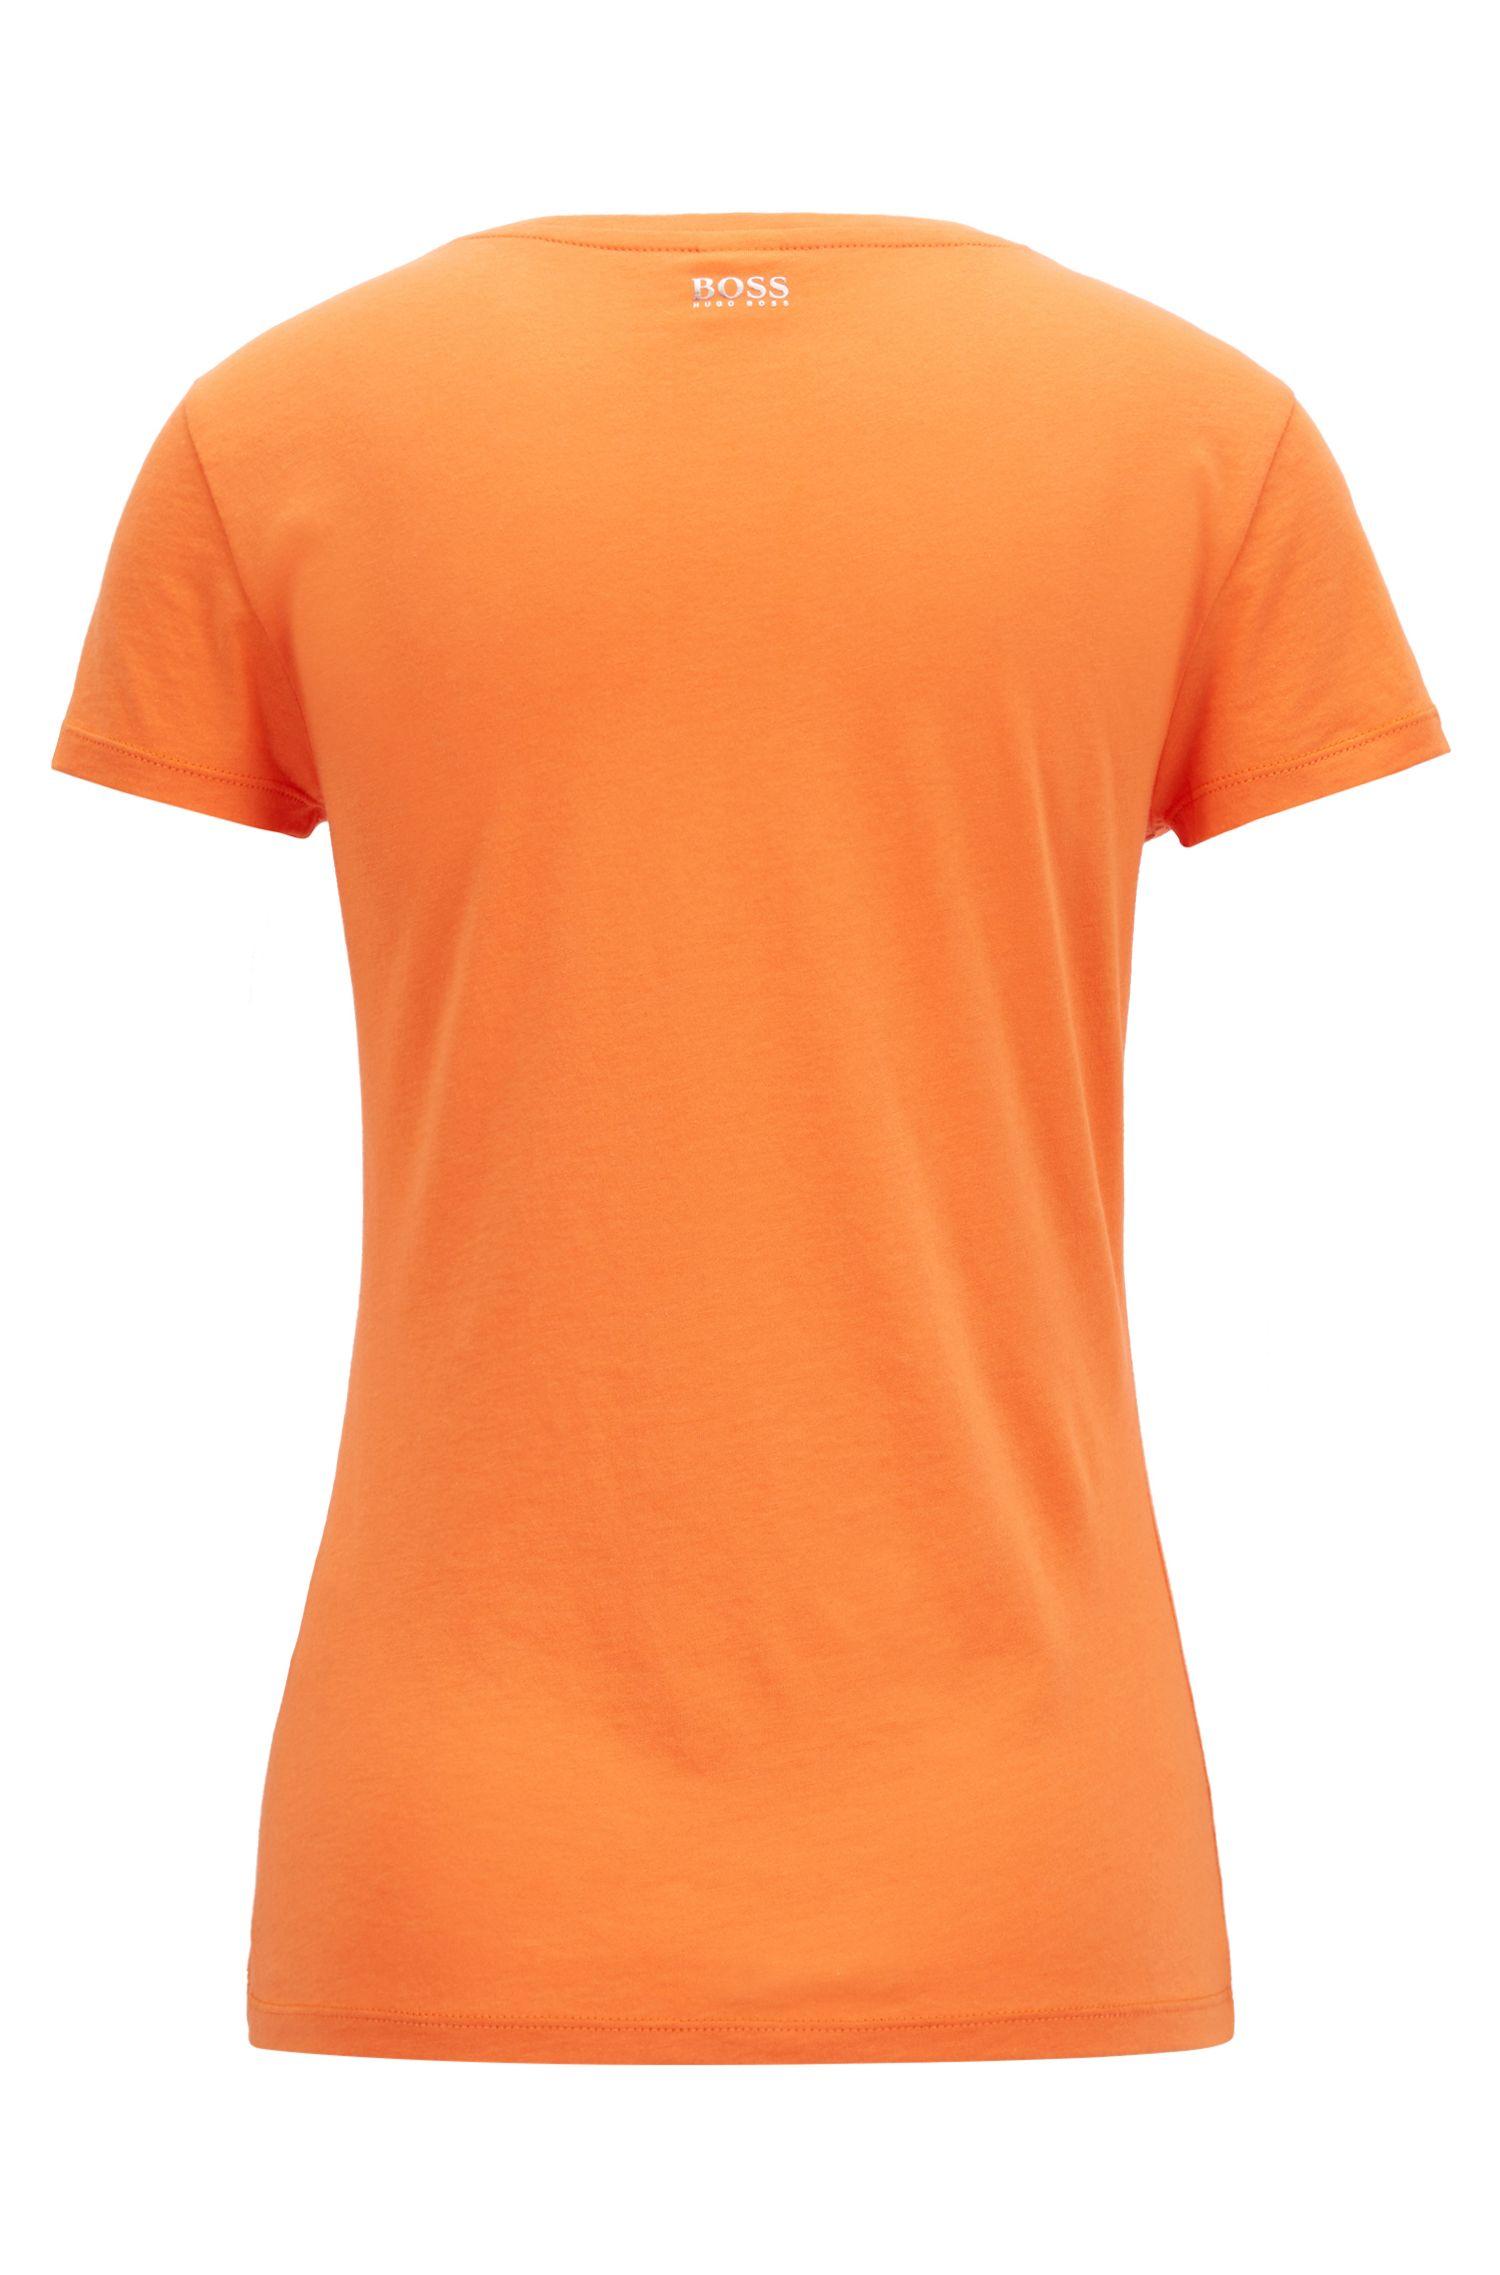 Top de punto con escote redondeado en mezcla de algodón Pima, Naranja